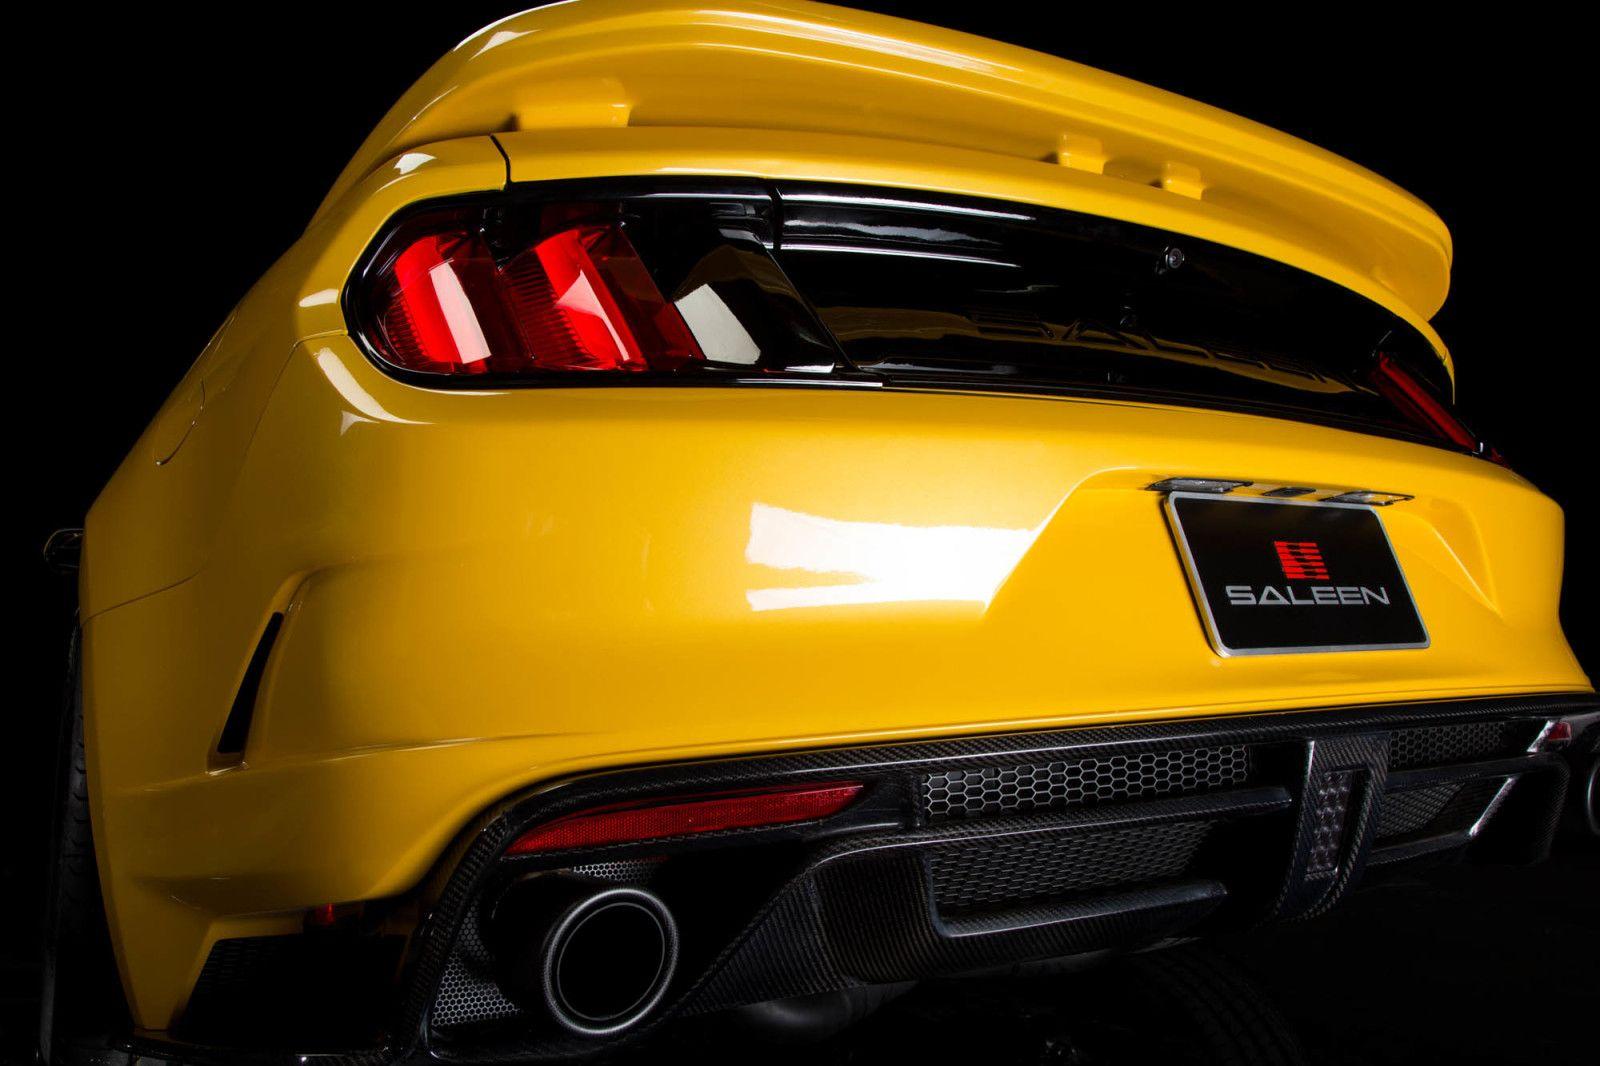 2015 Saleen 302 Mustang Black Label - Photo Gallery